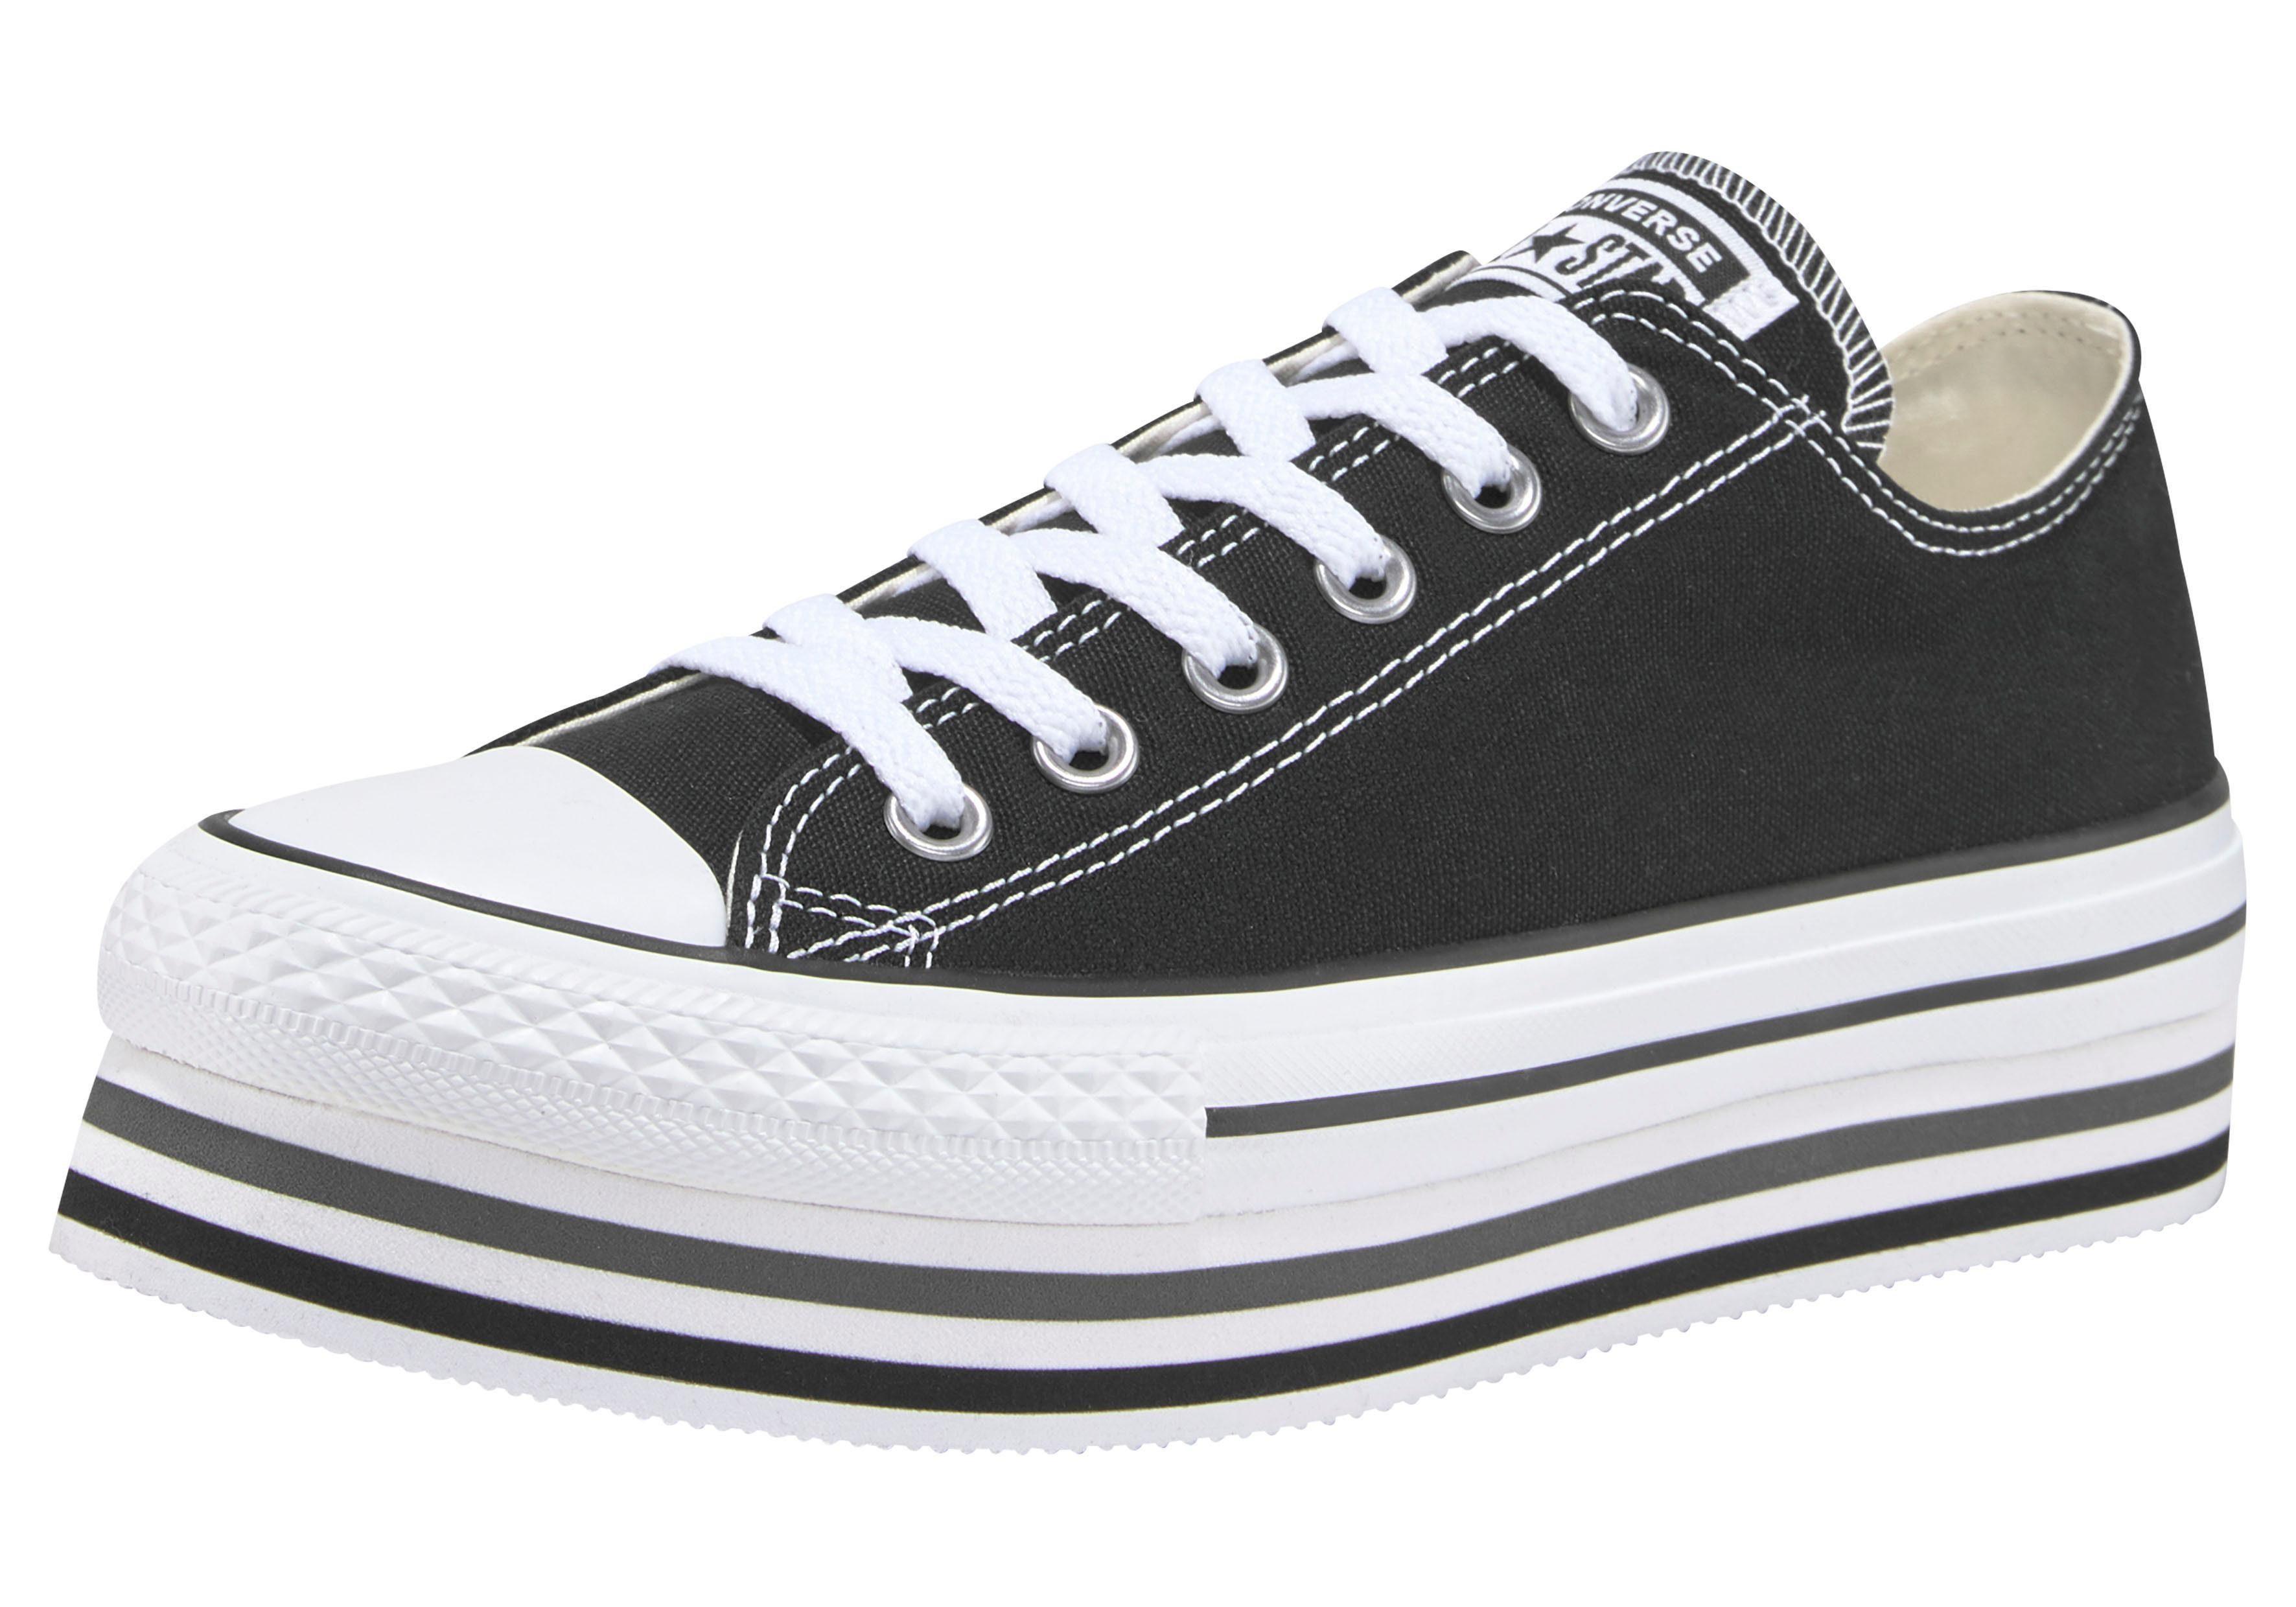 Converse »Chuck Taylor All Star Platform Layer Ox« Plateausneaker online kaufen | OTTO